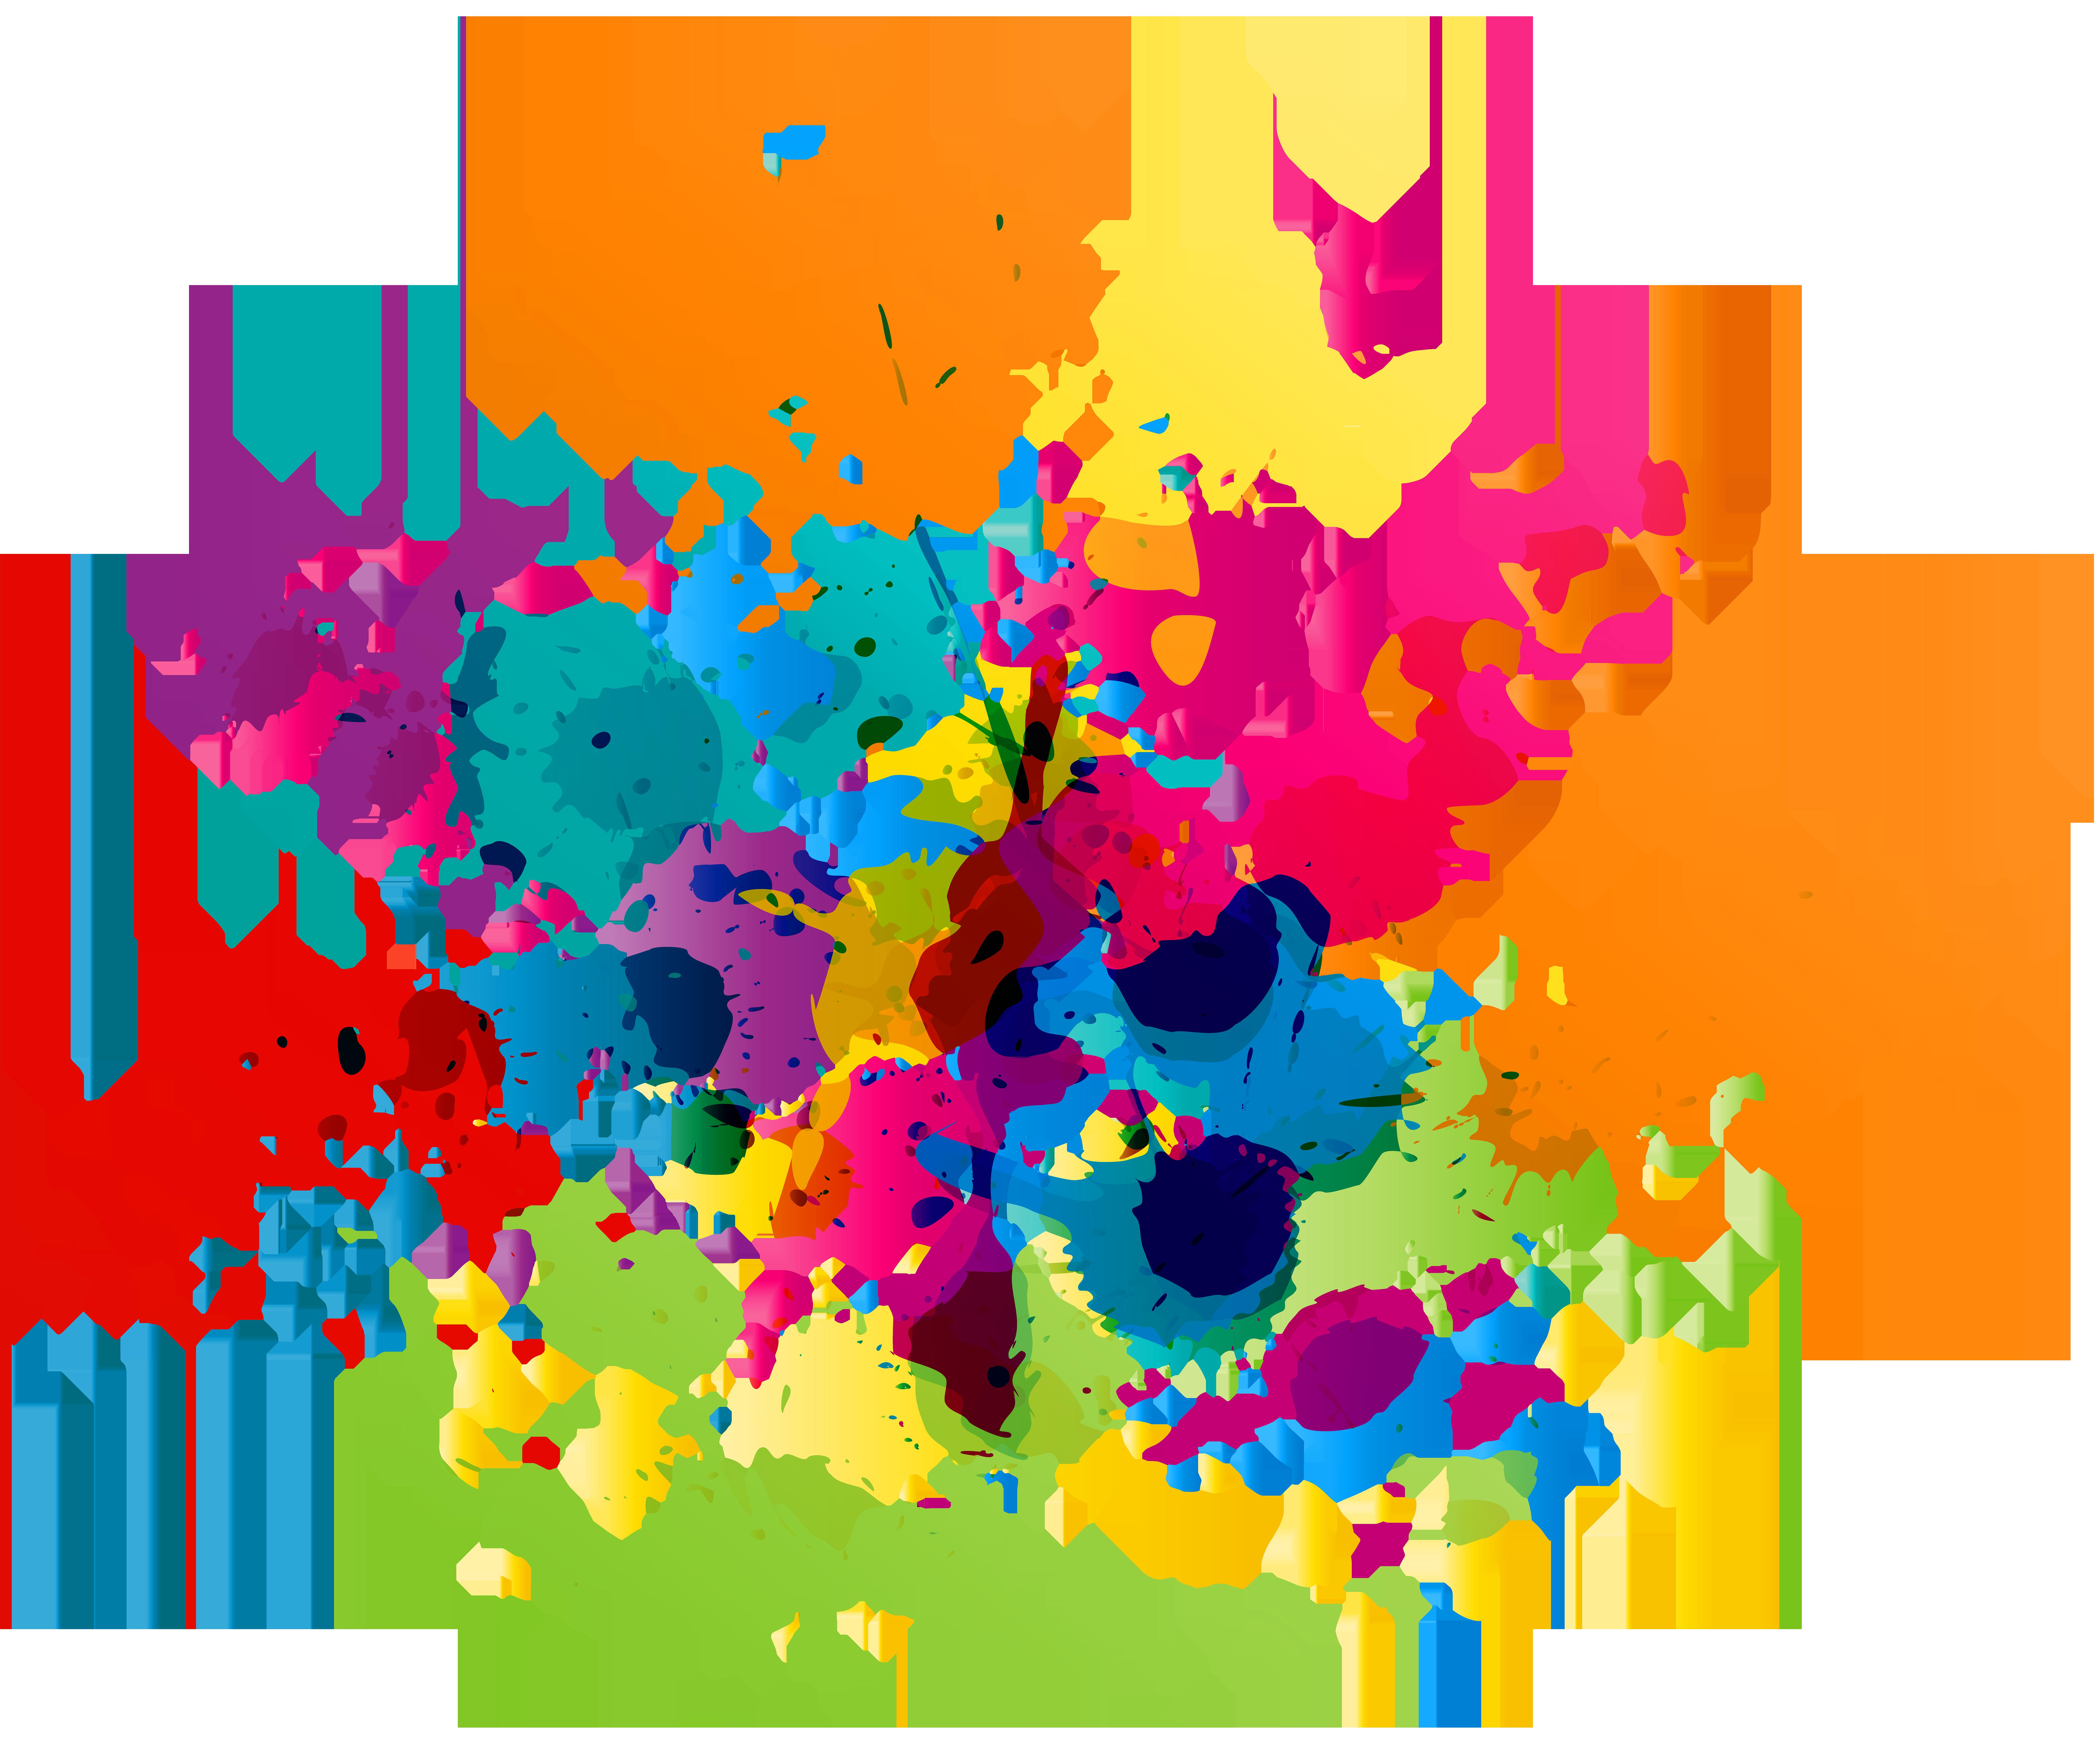 Splatter clipart transparent vector library library Colorful Paint Splatter Transparent Clip Art Image | Gallery ... vector library library